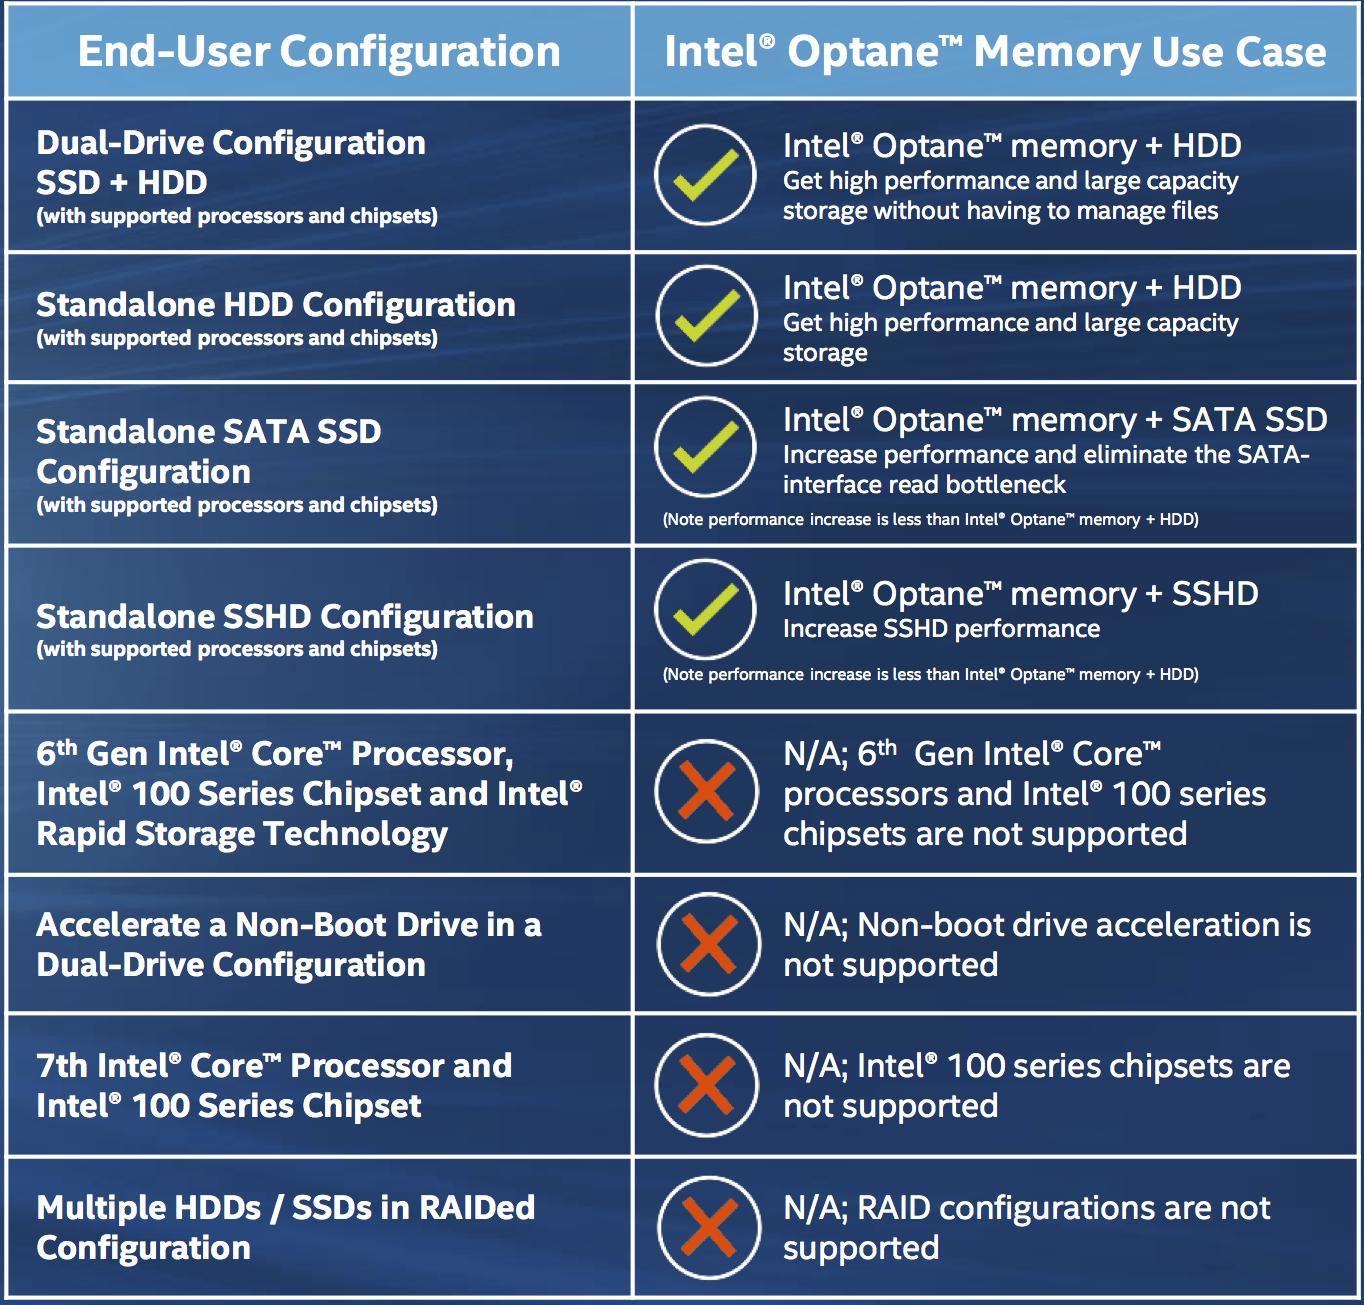 Intel's Caching History - The Intel Optane Memory (SSD